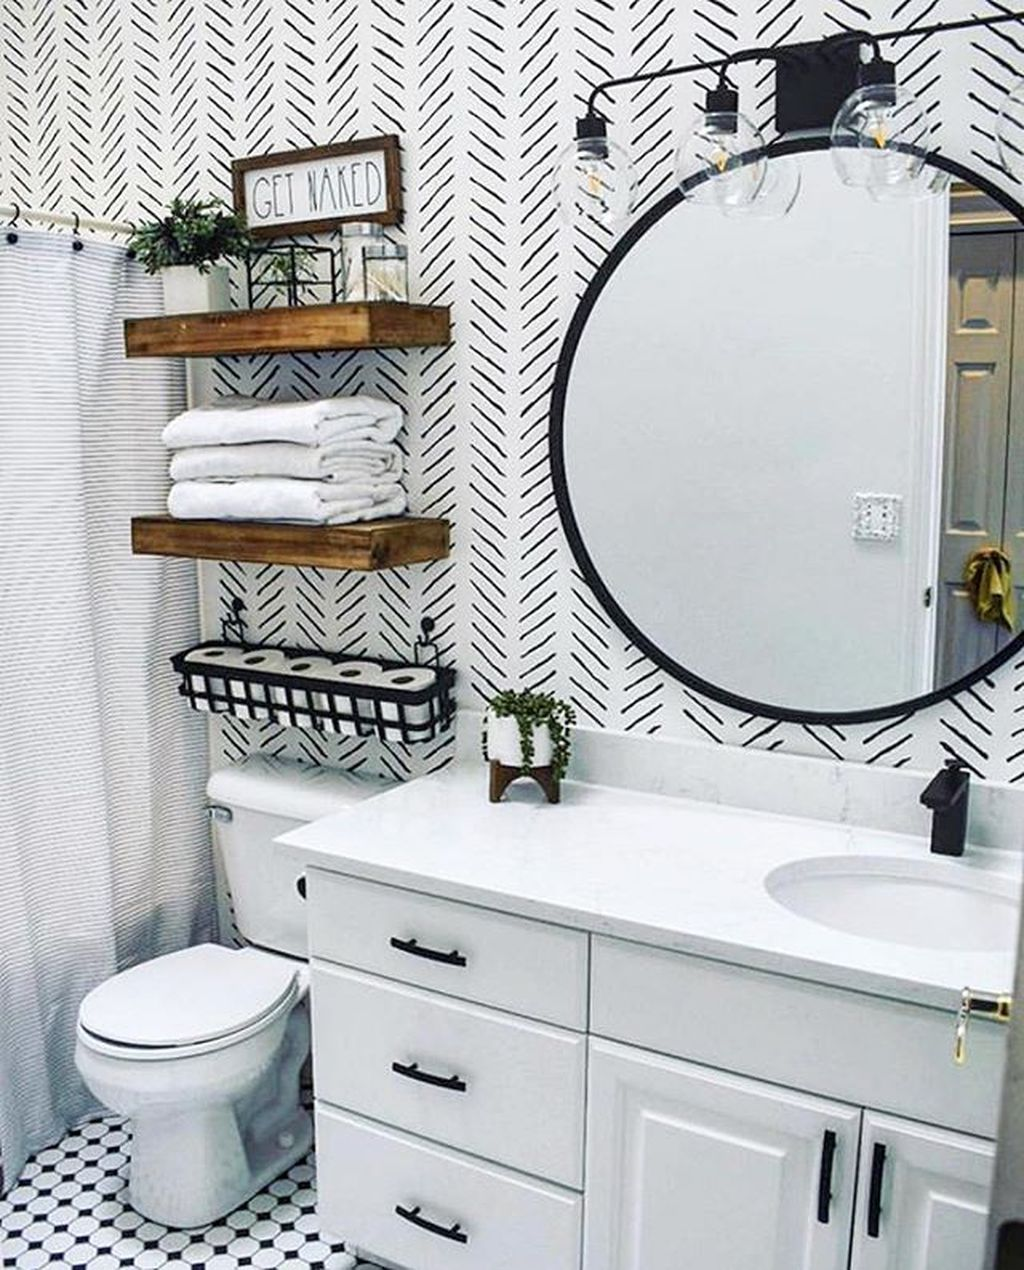 bathroom decor ebay #bathroom niche decor #bathroom decor mr price